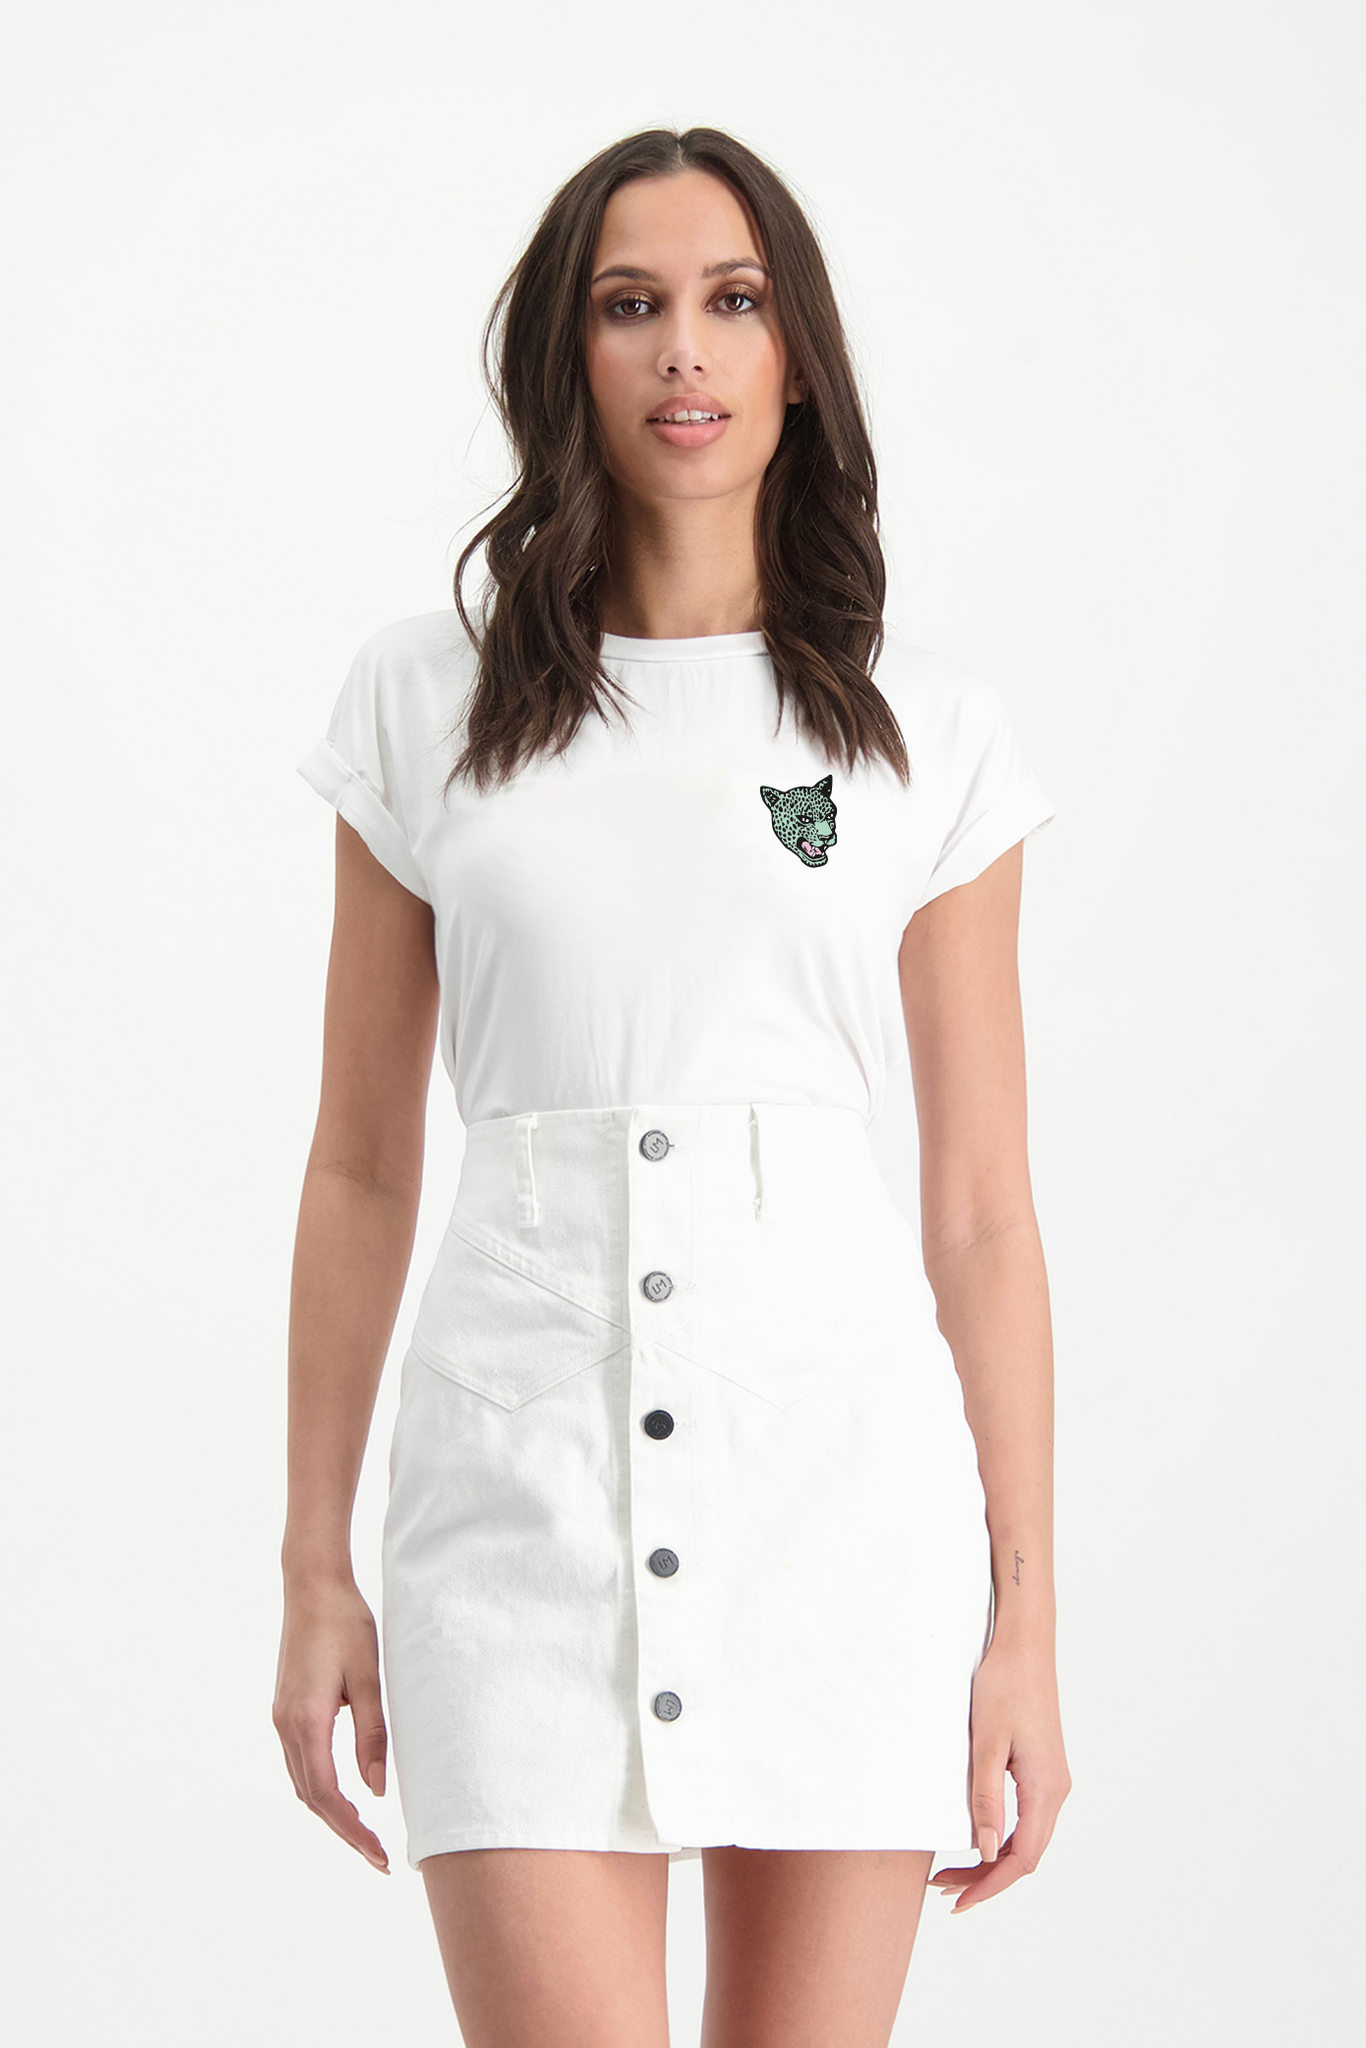 Lofty Manner T-shirt Jady White